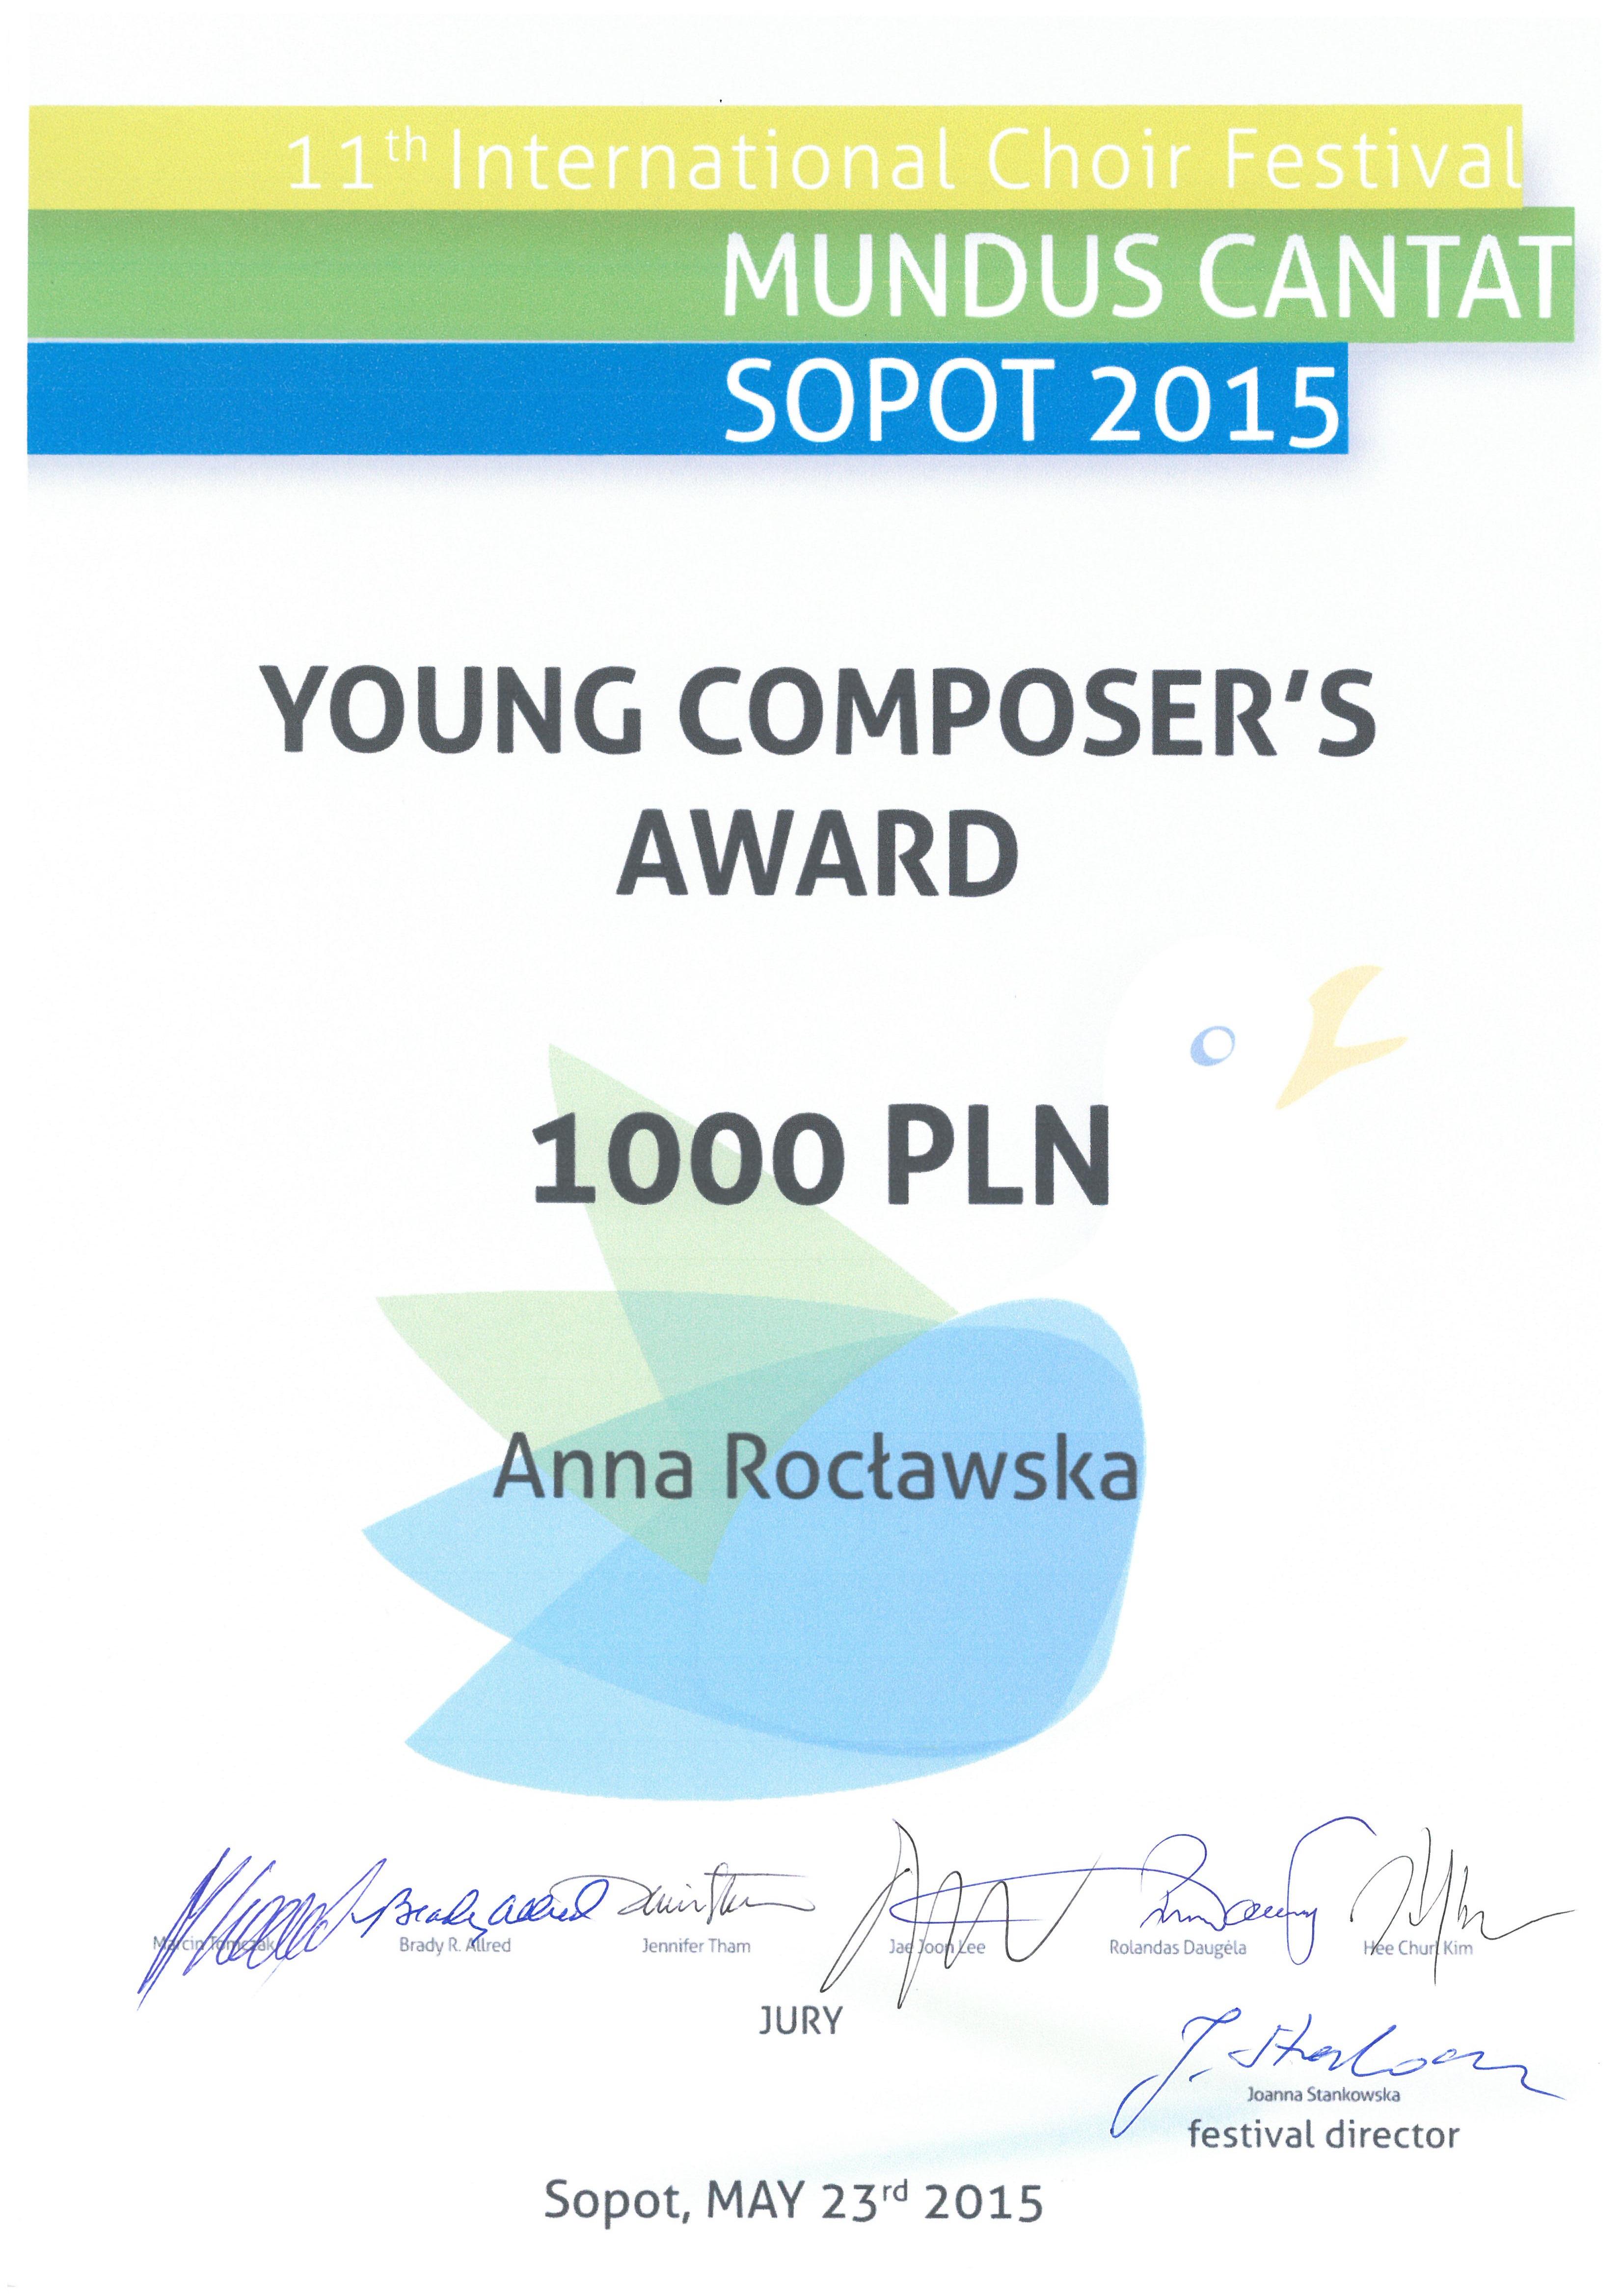 Anna Roclawska_nagroda_kompozycja_Mundus Cantat_2015